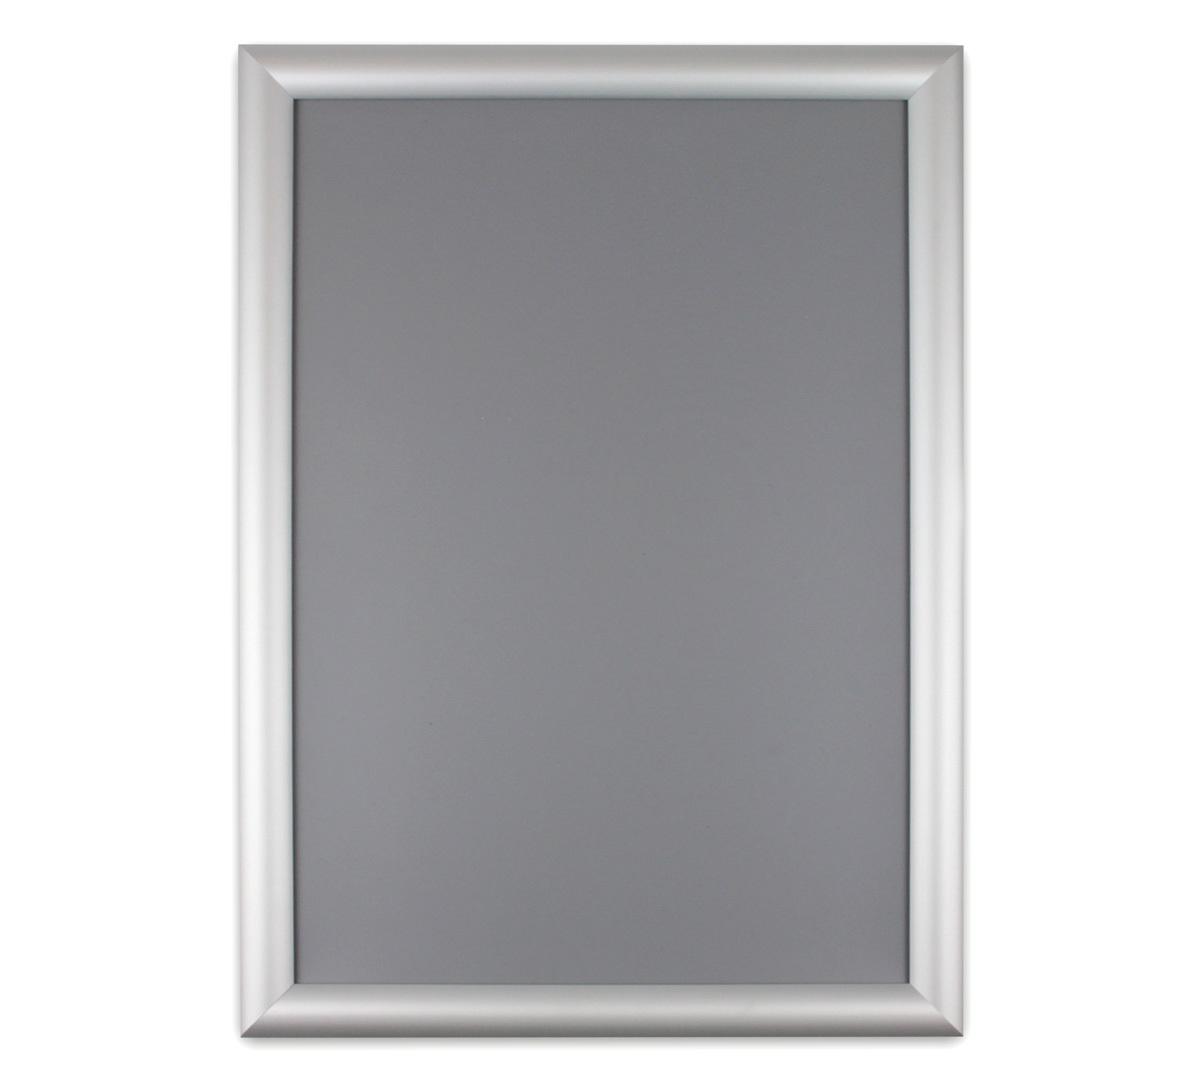 Ramka OWZ A3 plakatowa zatrzaskowa aluminiowa